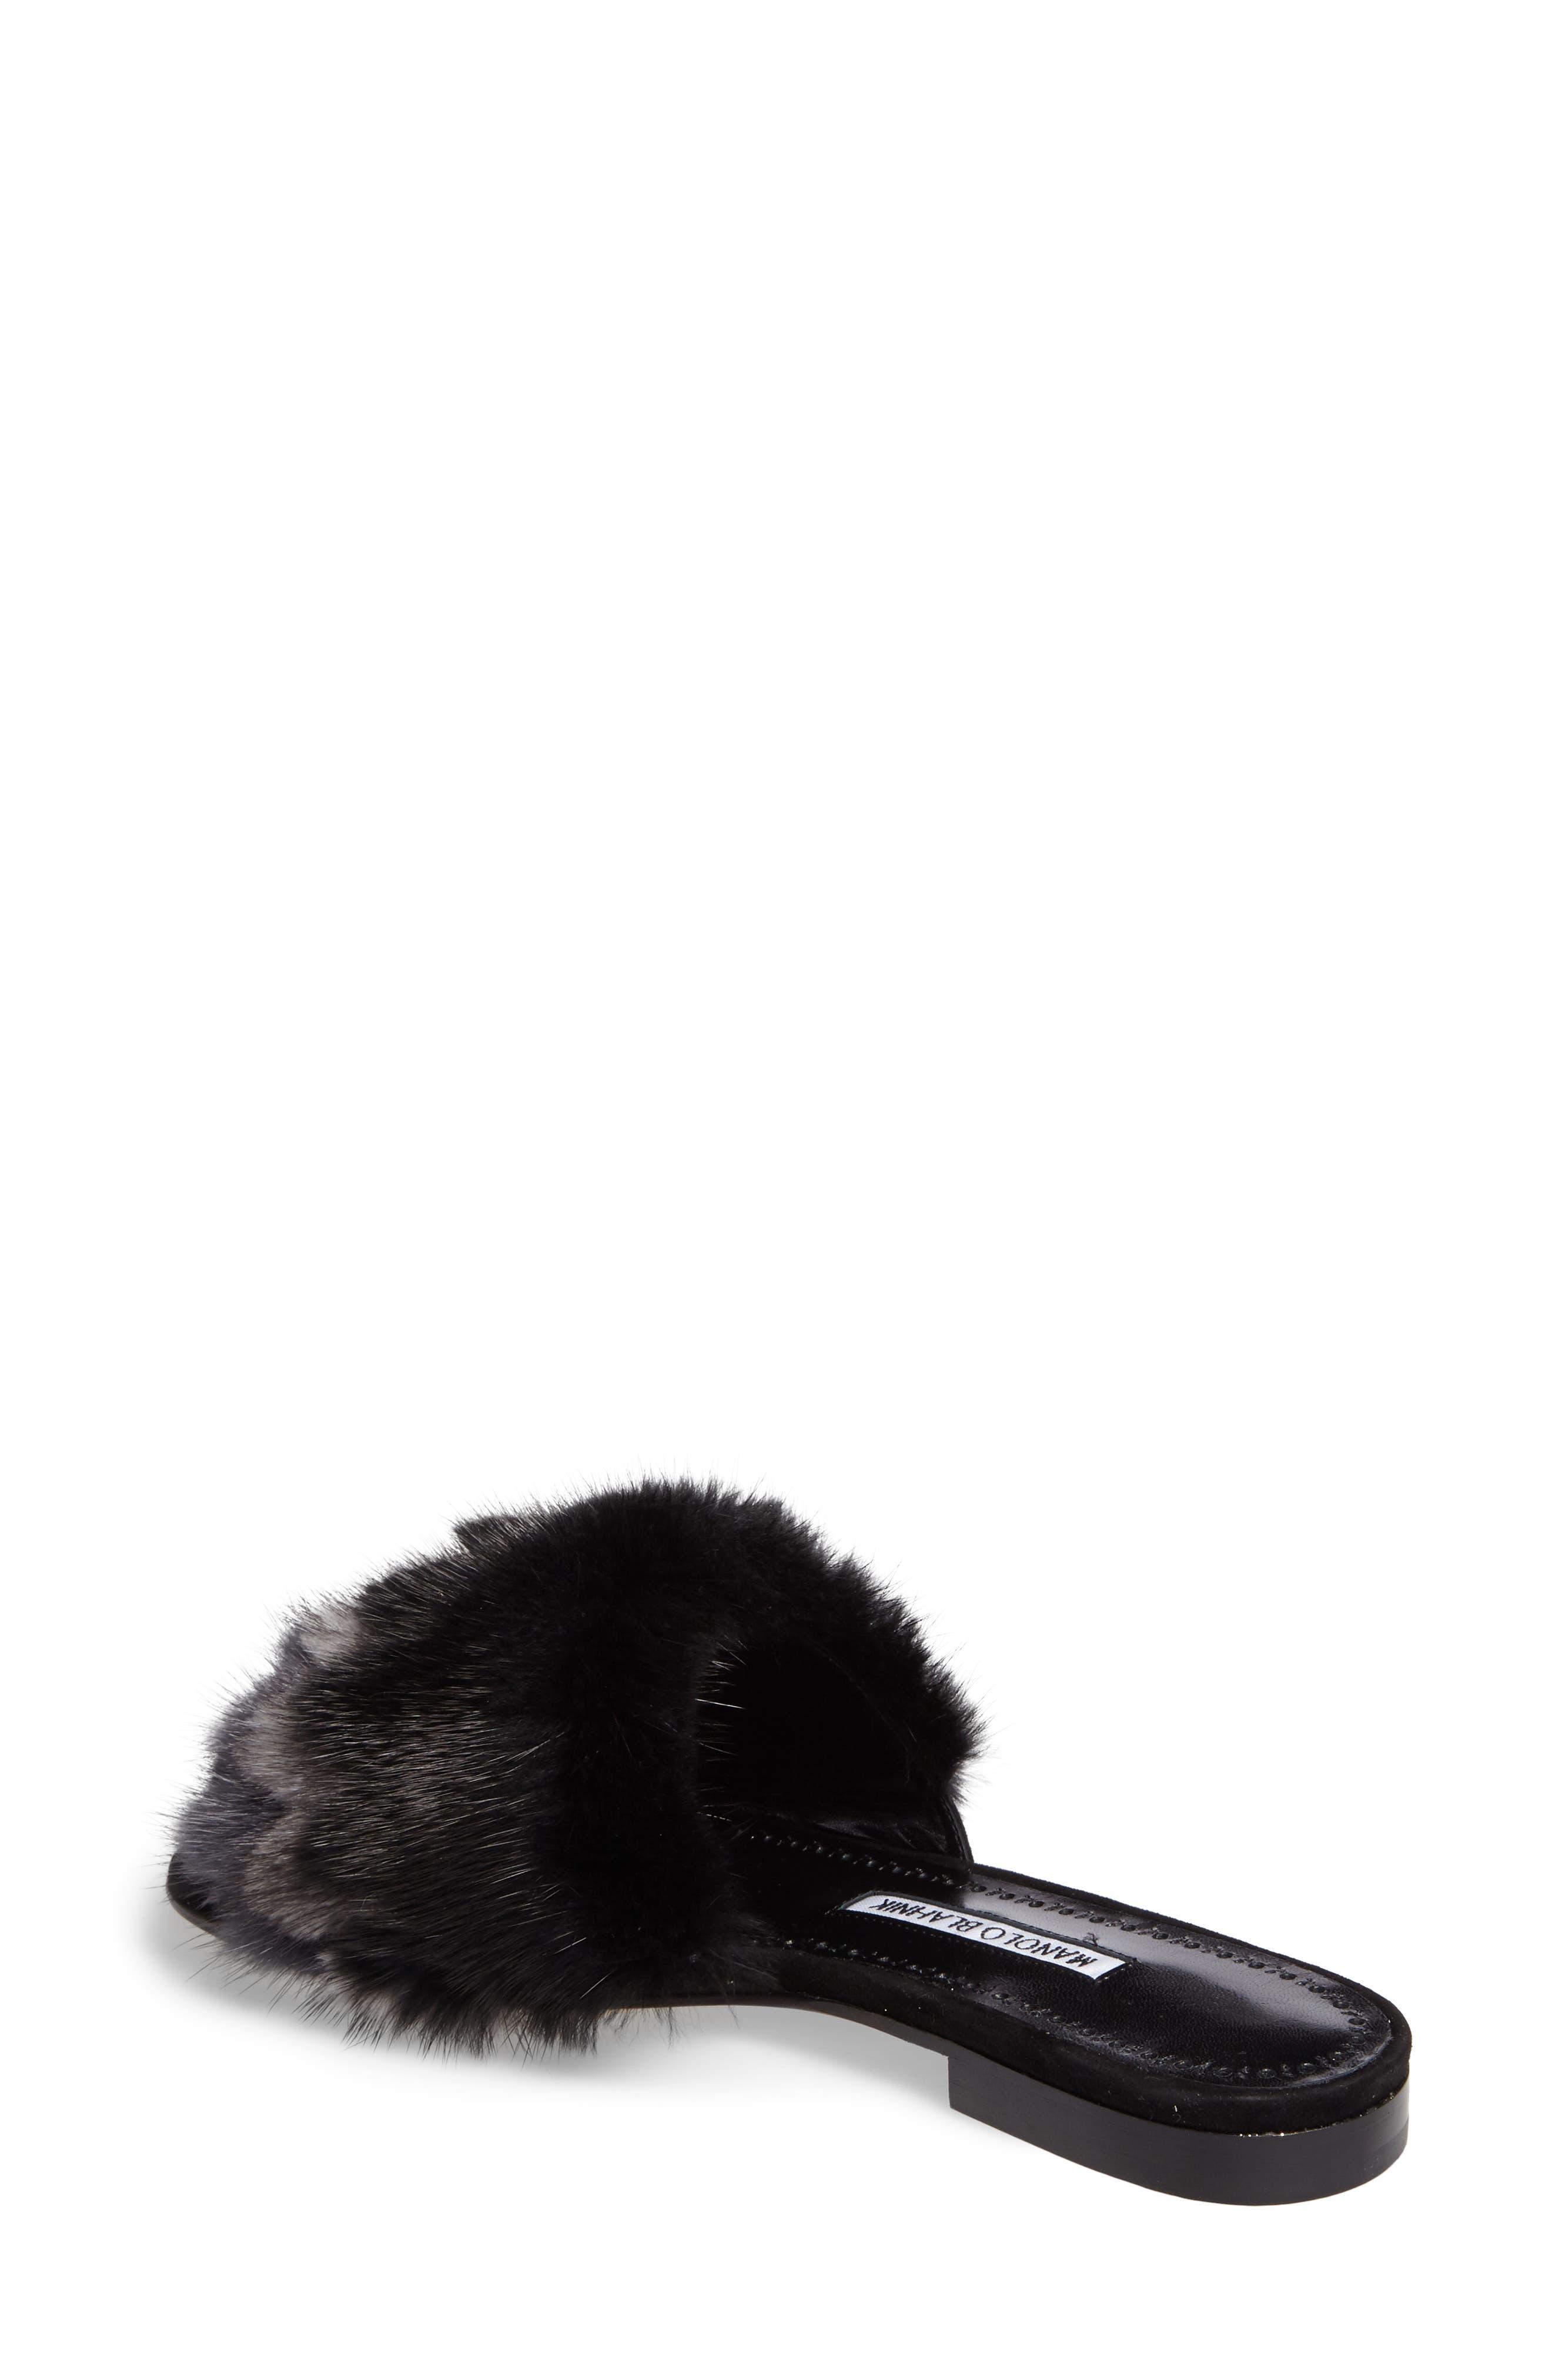 Pelosusmin Genuine Mink Fur Slide Sandal,                             Alternate thumbnail 2, color,                             001